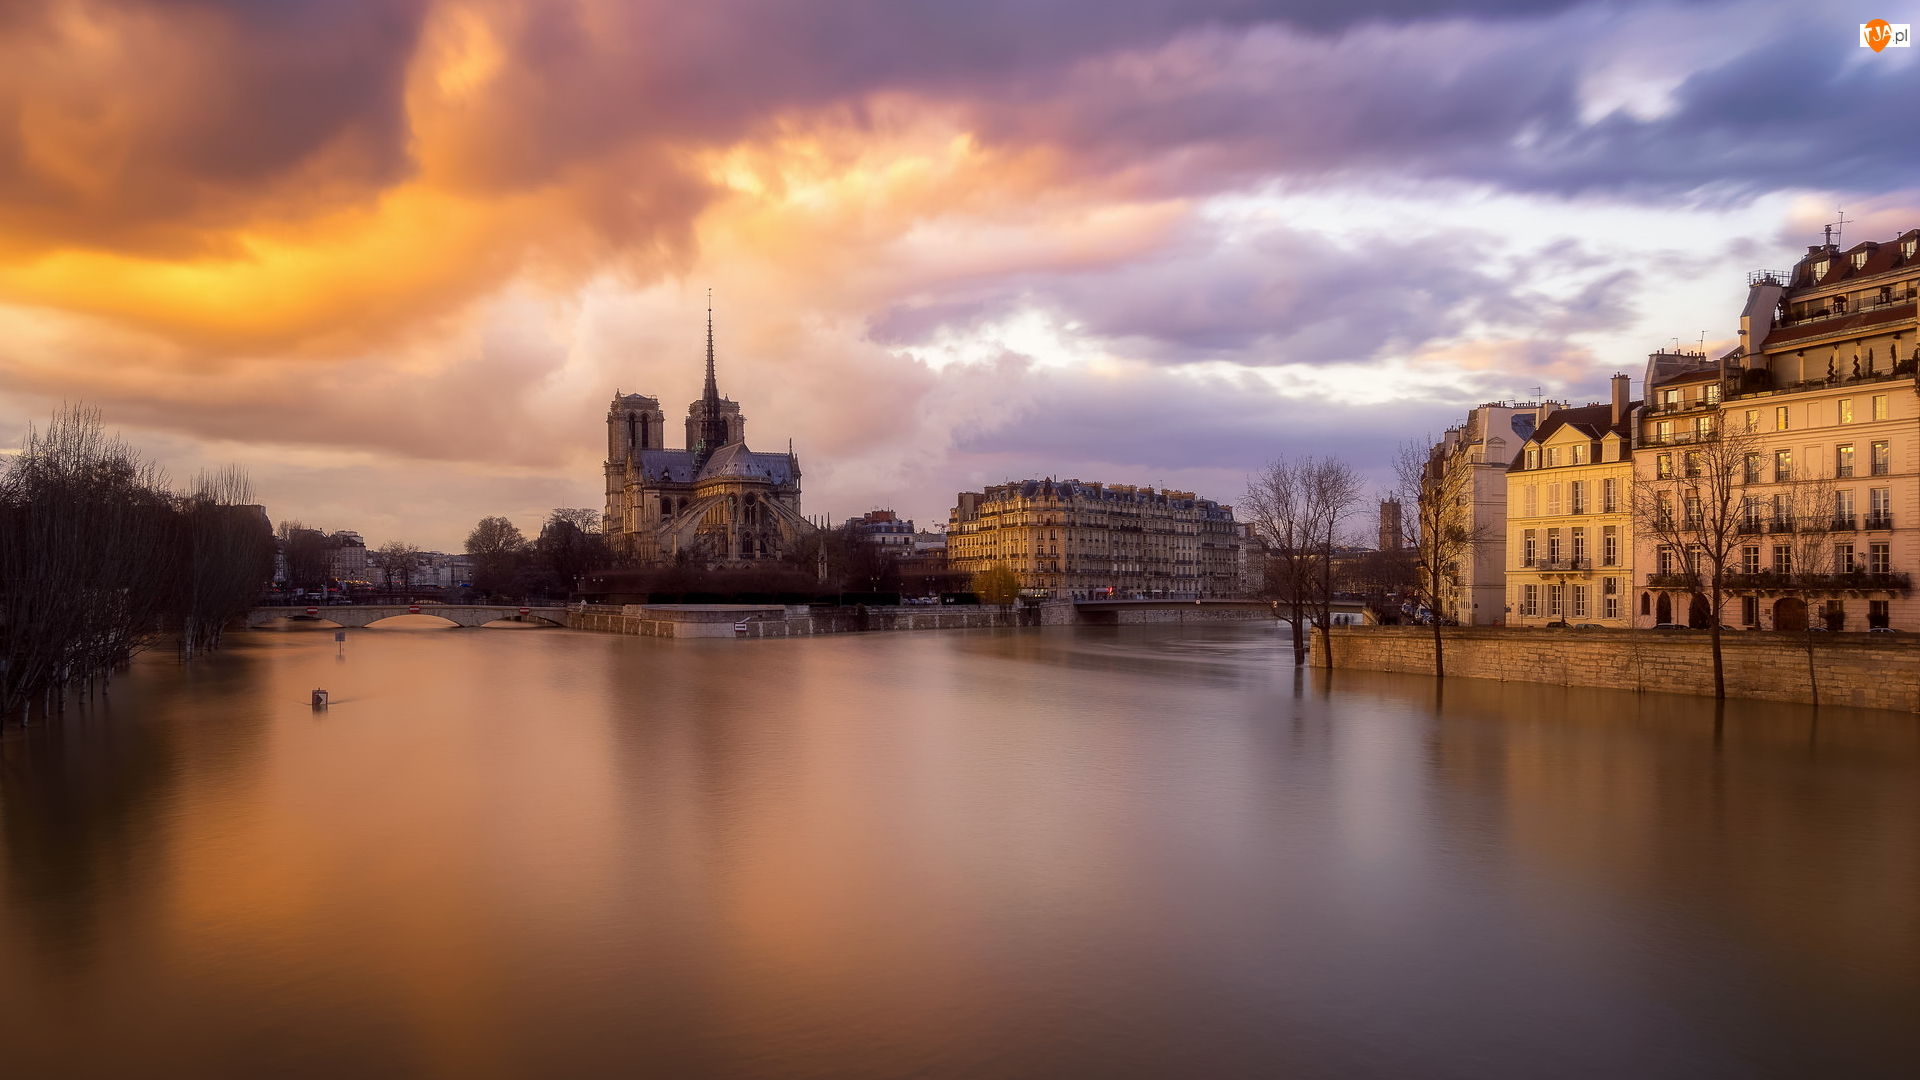 Domy, Francja, Katedra Notre Dame, Rzeka Sekwana, Paryż